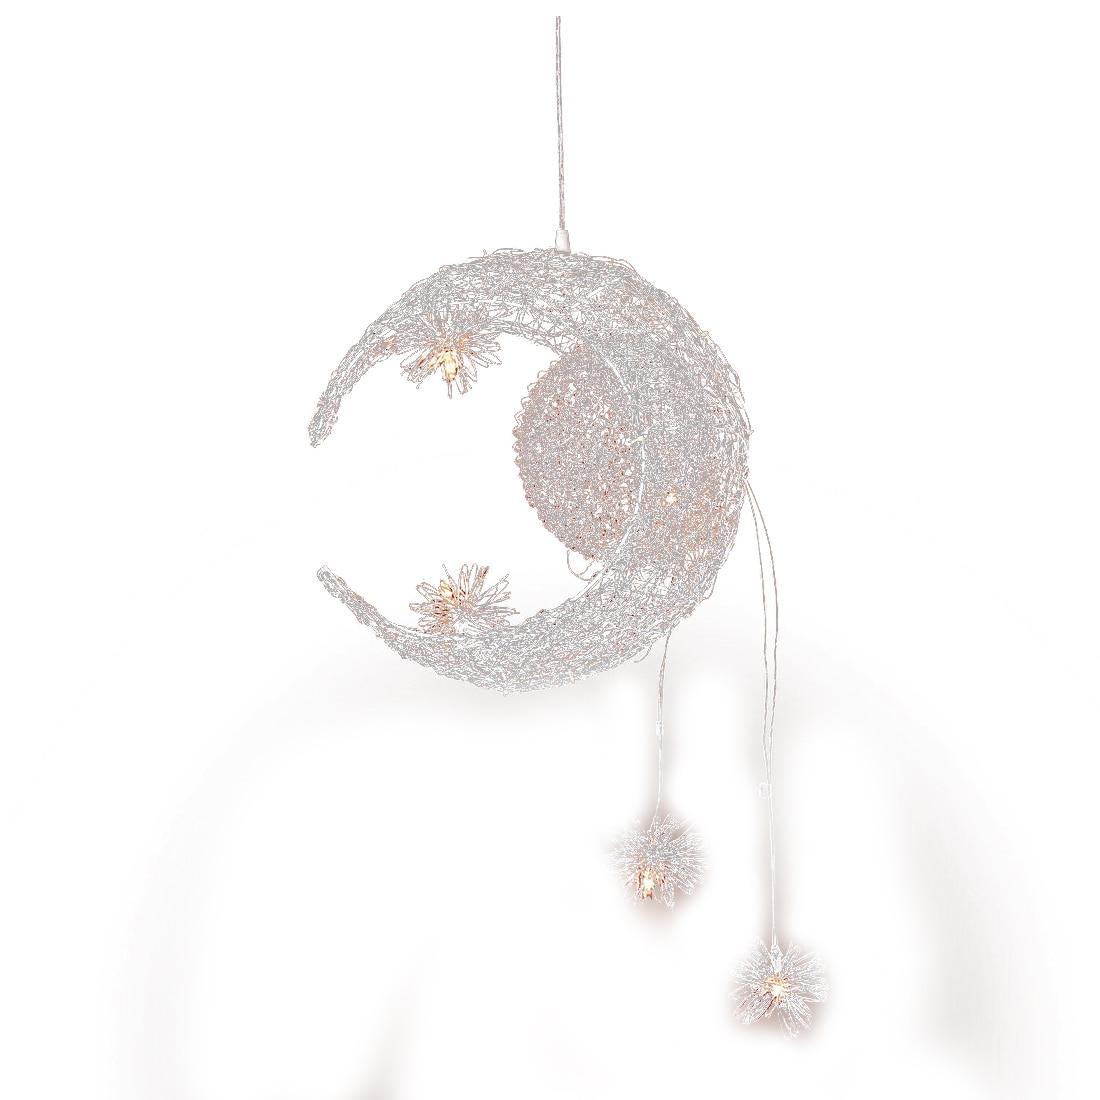 Moon & Star Sweet Bedroom Lighting Pendant Lamp Chandelier Fixture брошь moon paris moon paris mo038dwynx31